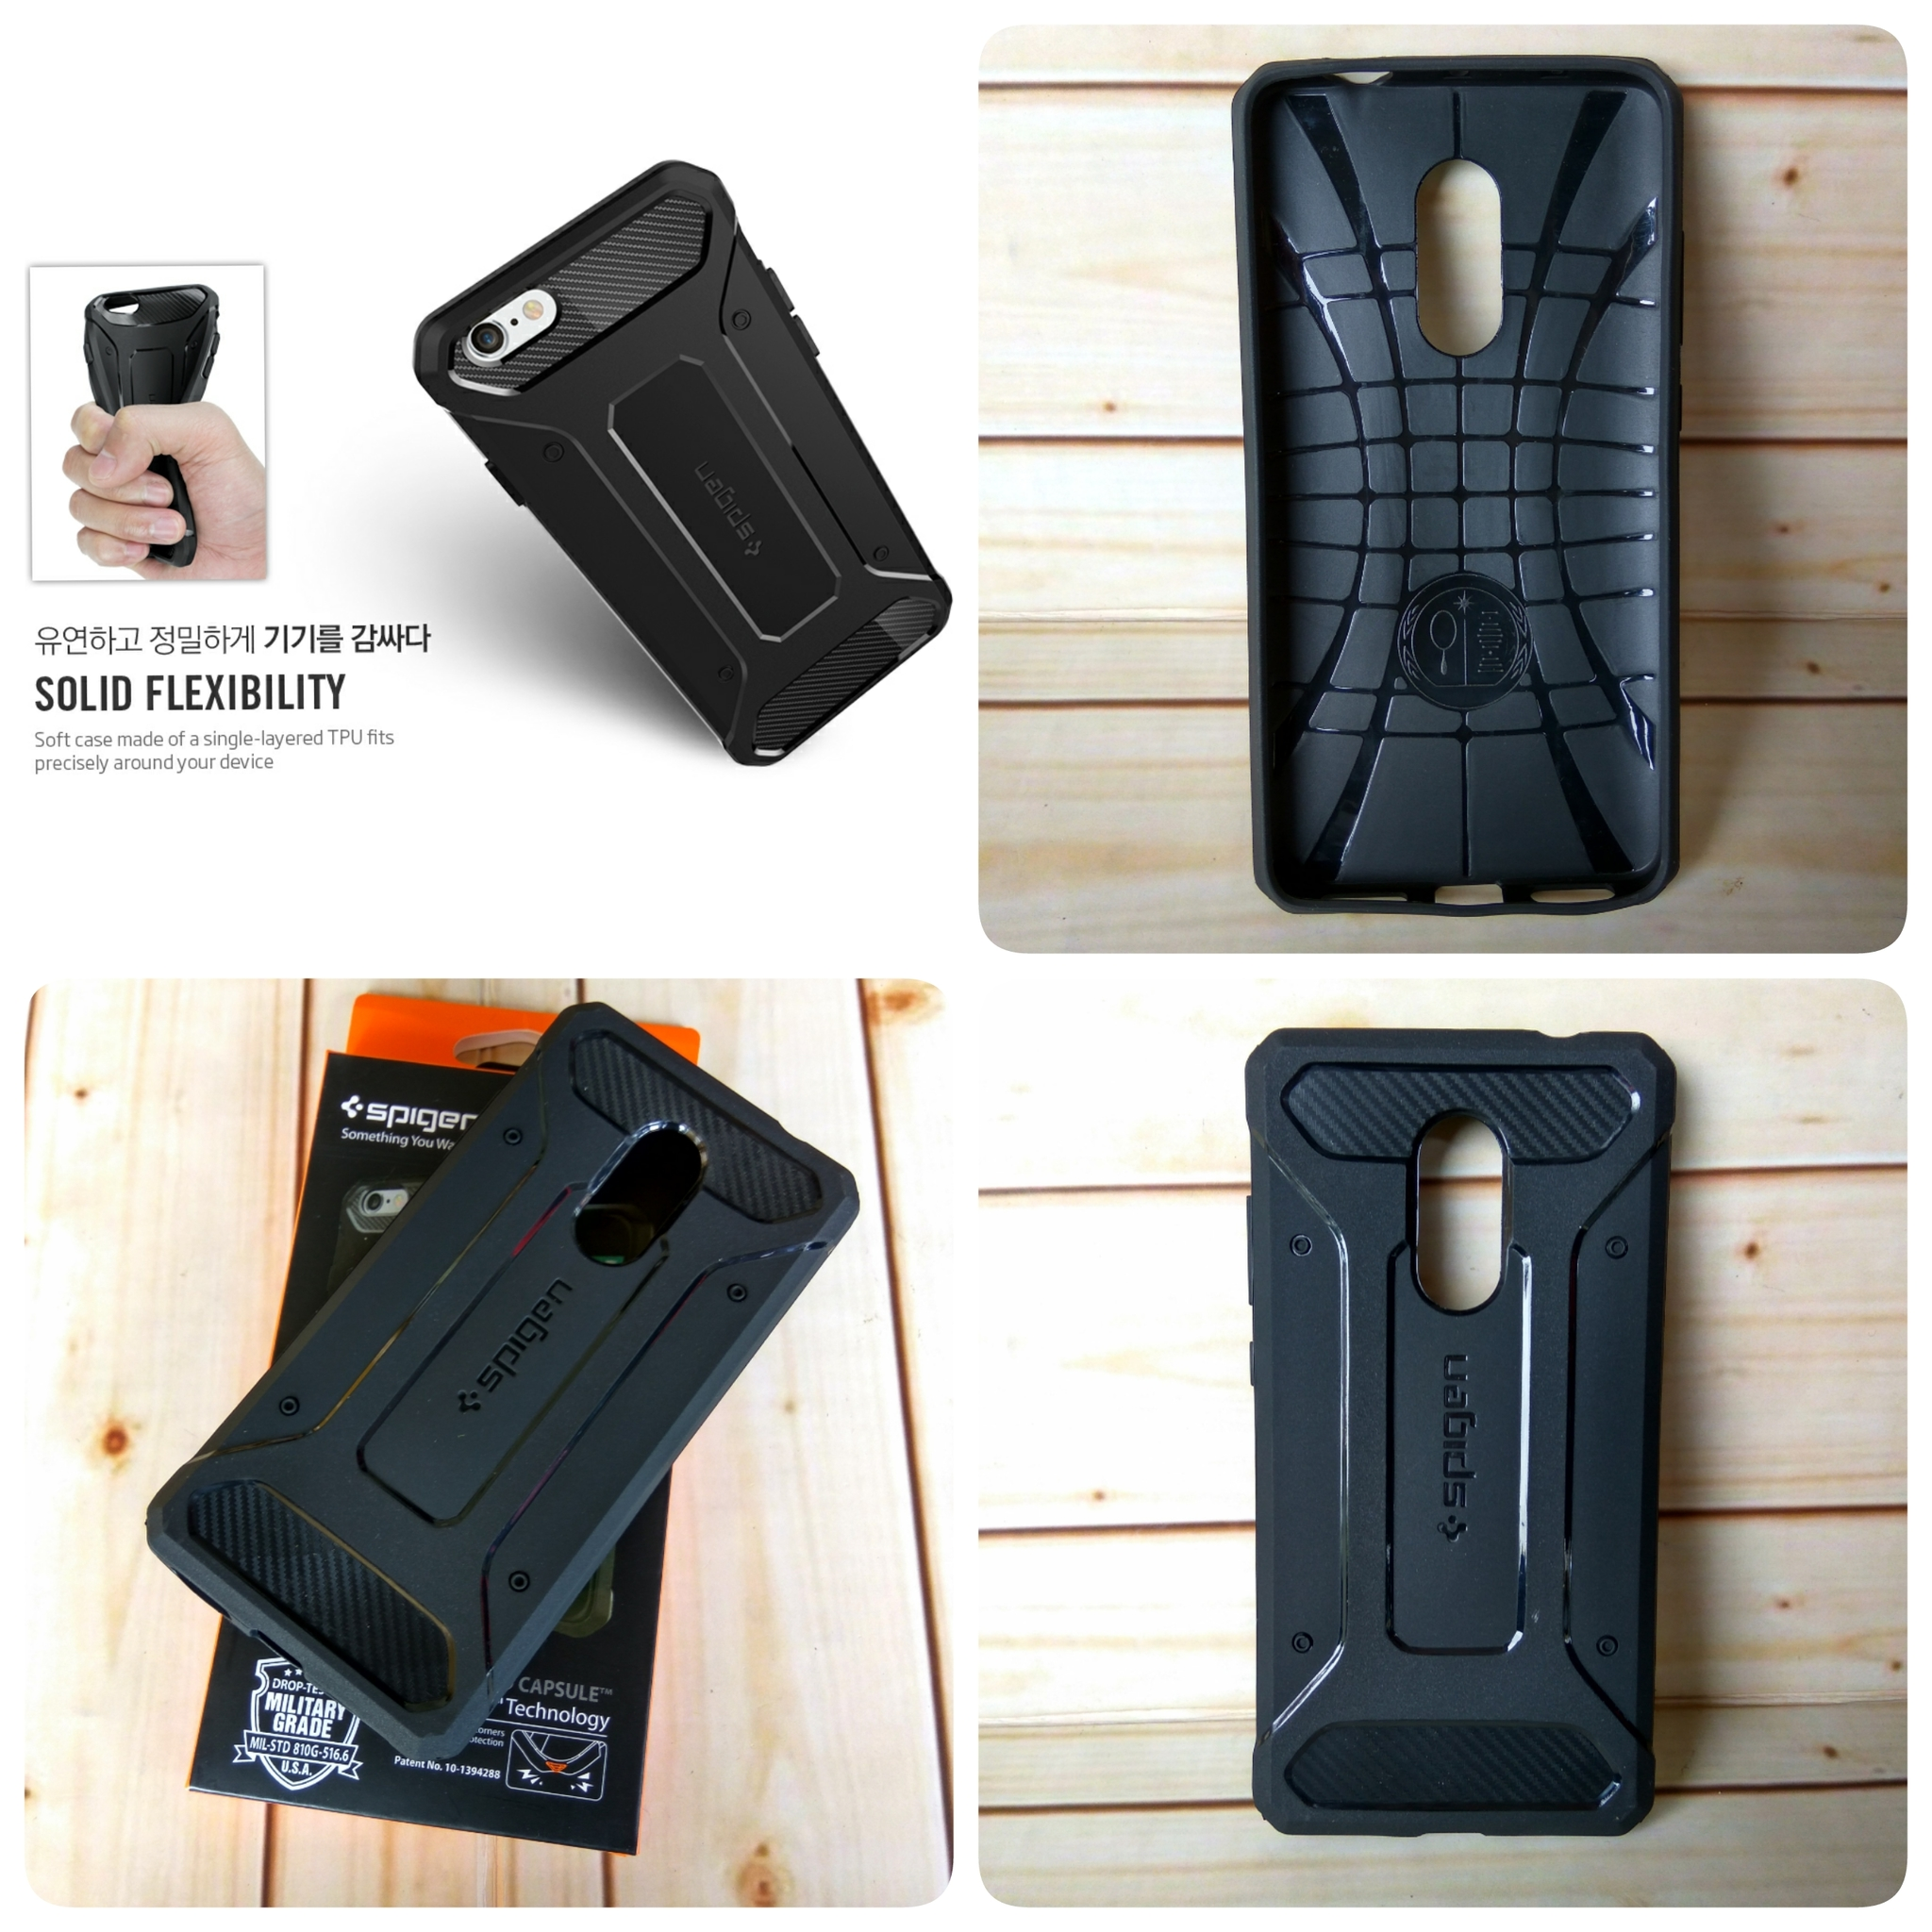 online store 0f2a2 2b7ee Jual SA Case Spigen Rugged Capsule Armor Xiaomi Redmi Note 4 ...